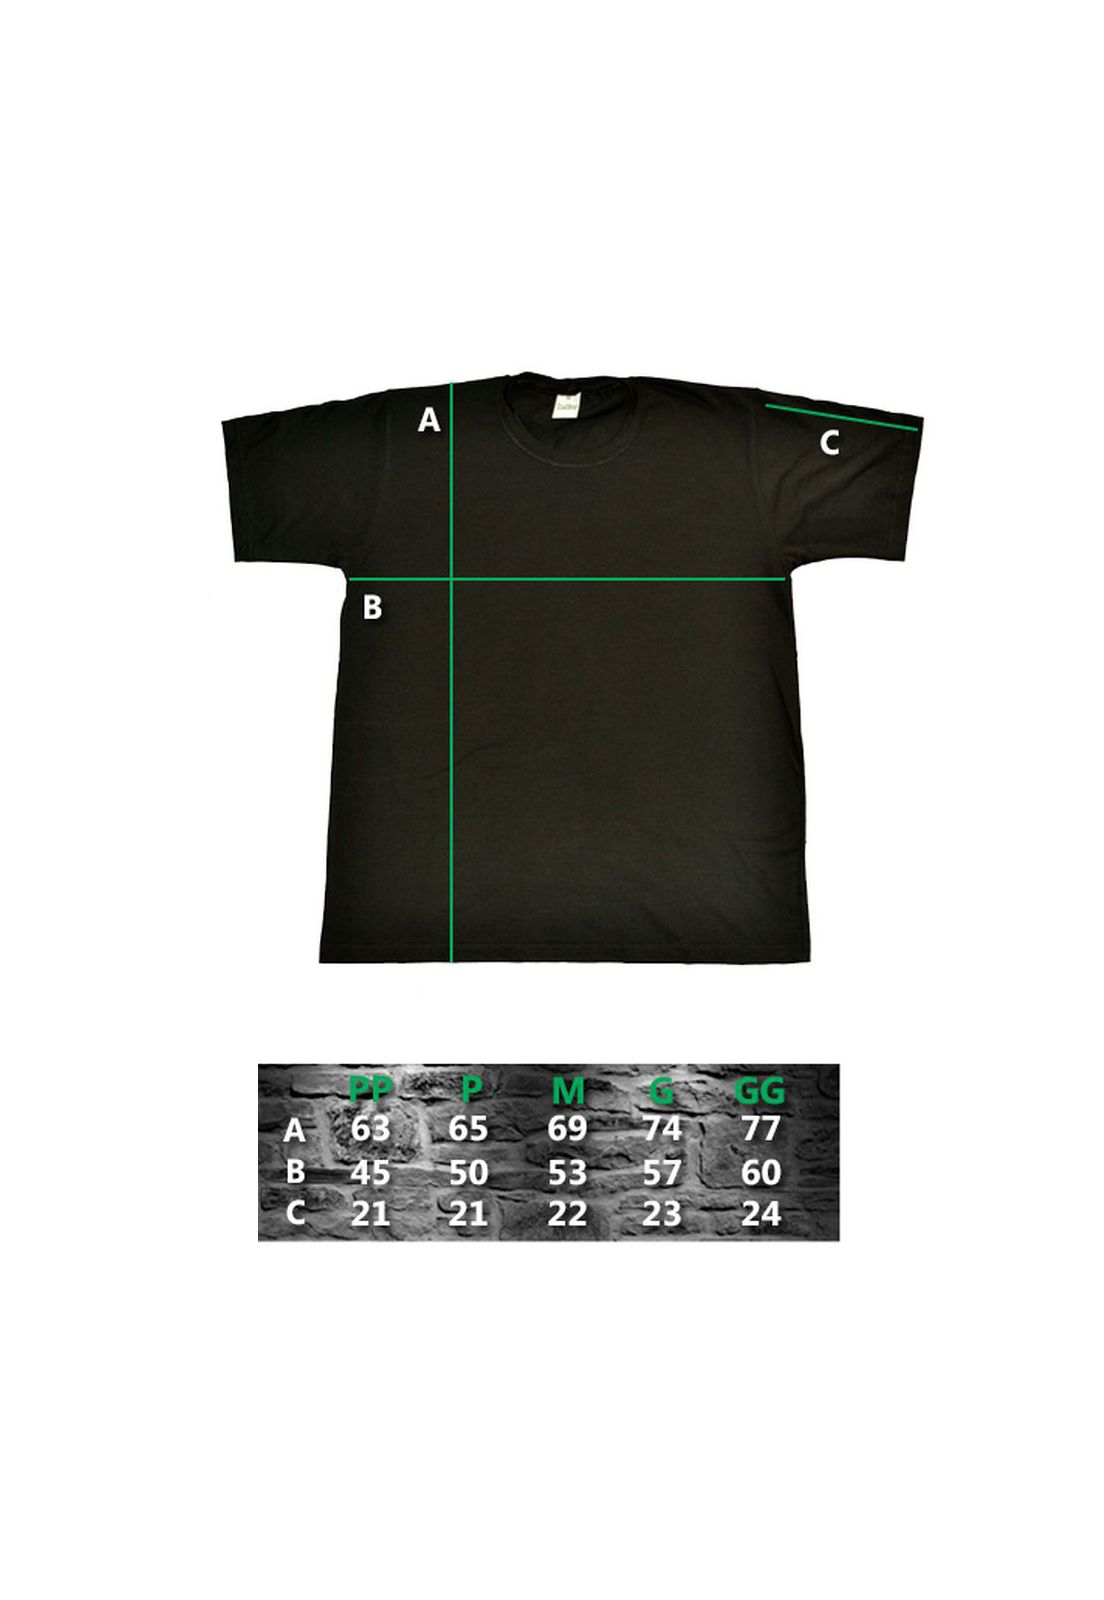 Camiseta Hooligans Brasão Preto  - HShop